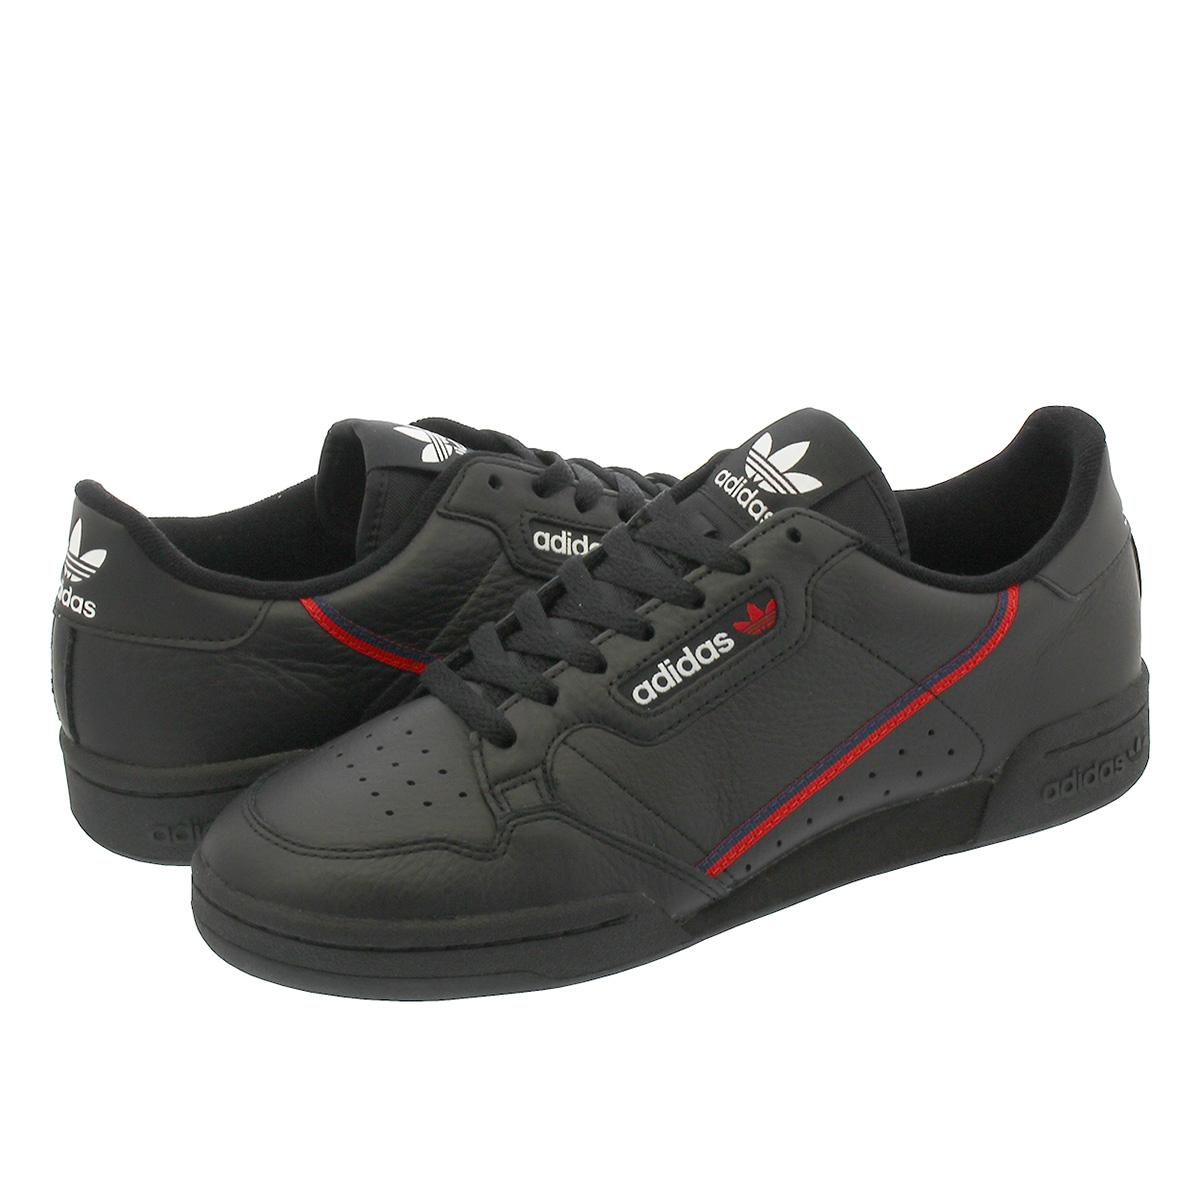 261fe99e9f9a4 adidas CONTINENTAL 80 Adidas Continental 80 CORE BLACK/SCARLET/COLLEGIATE  NAVY b41672